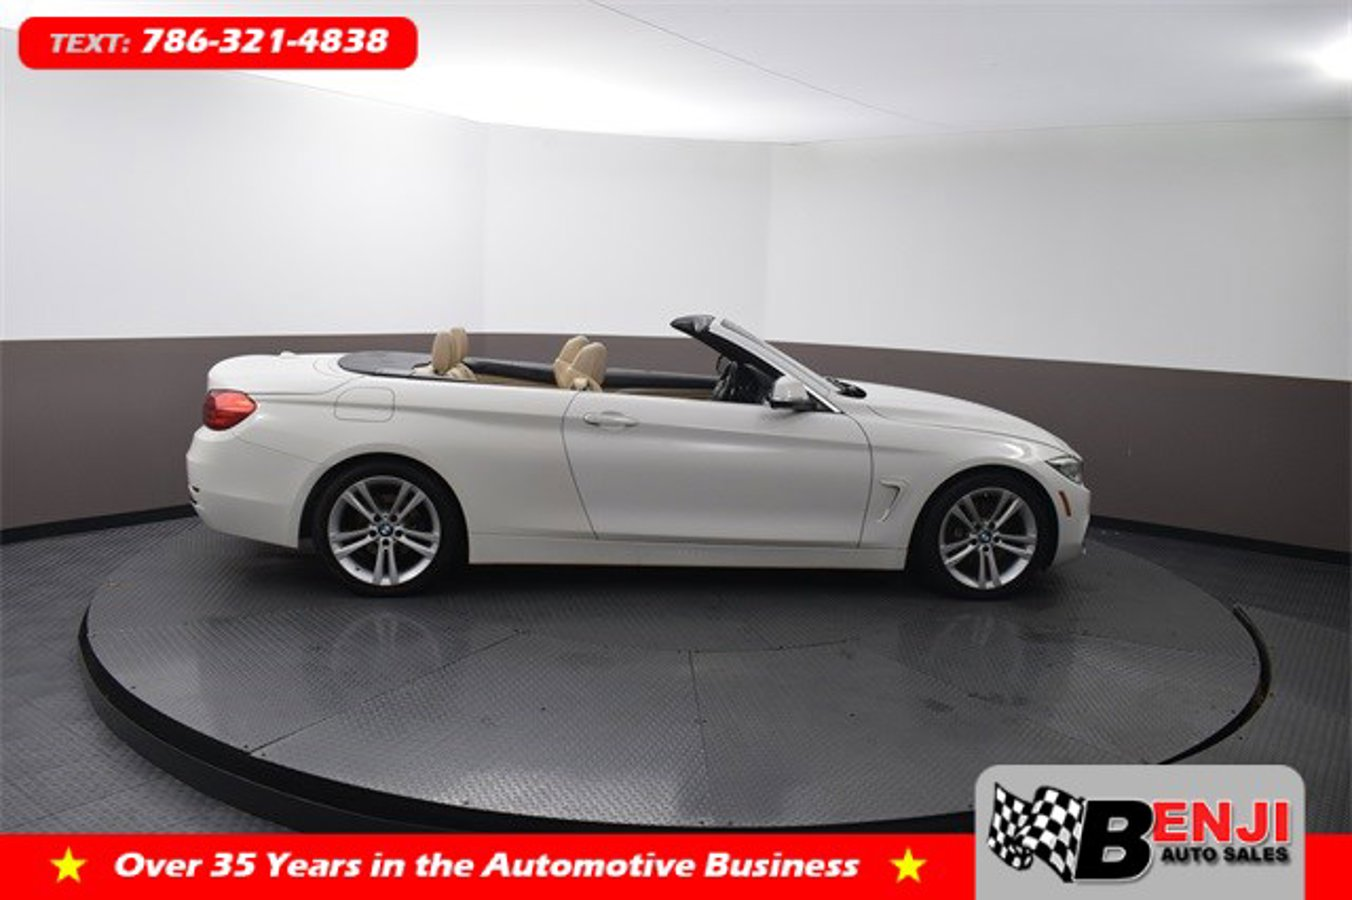 Used BMW 4-SERIES 2016 BROWARD 428I